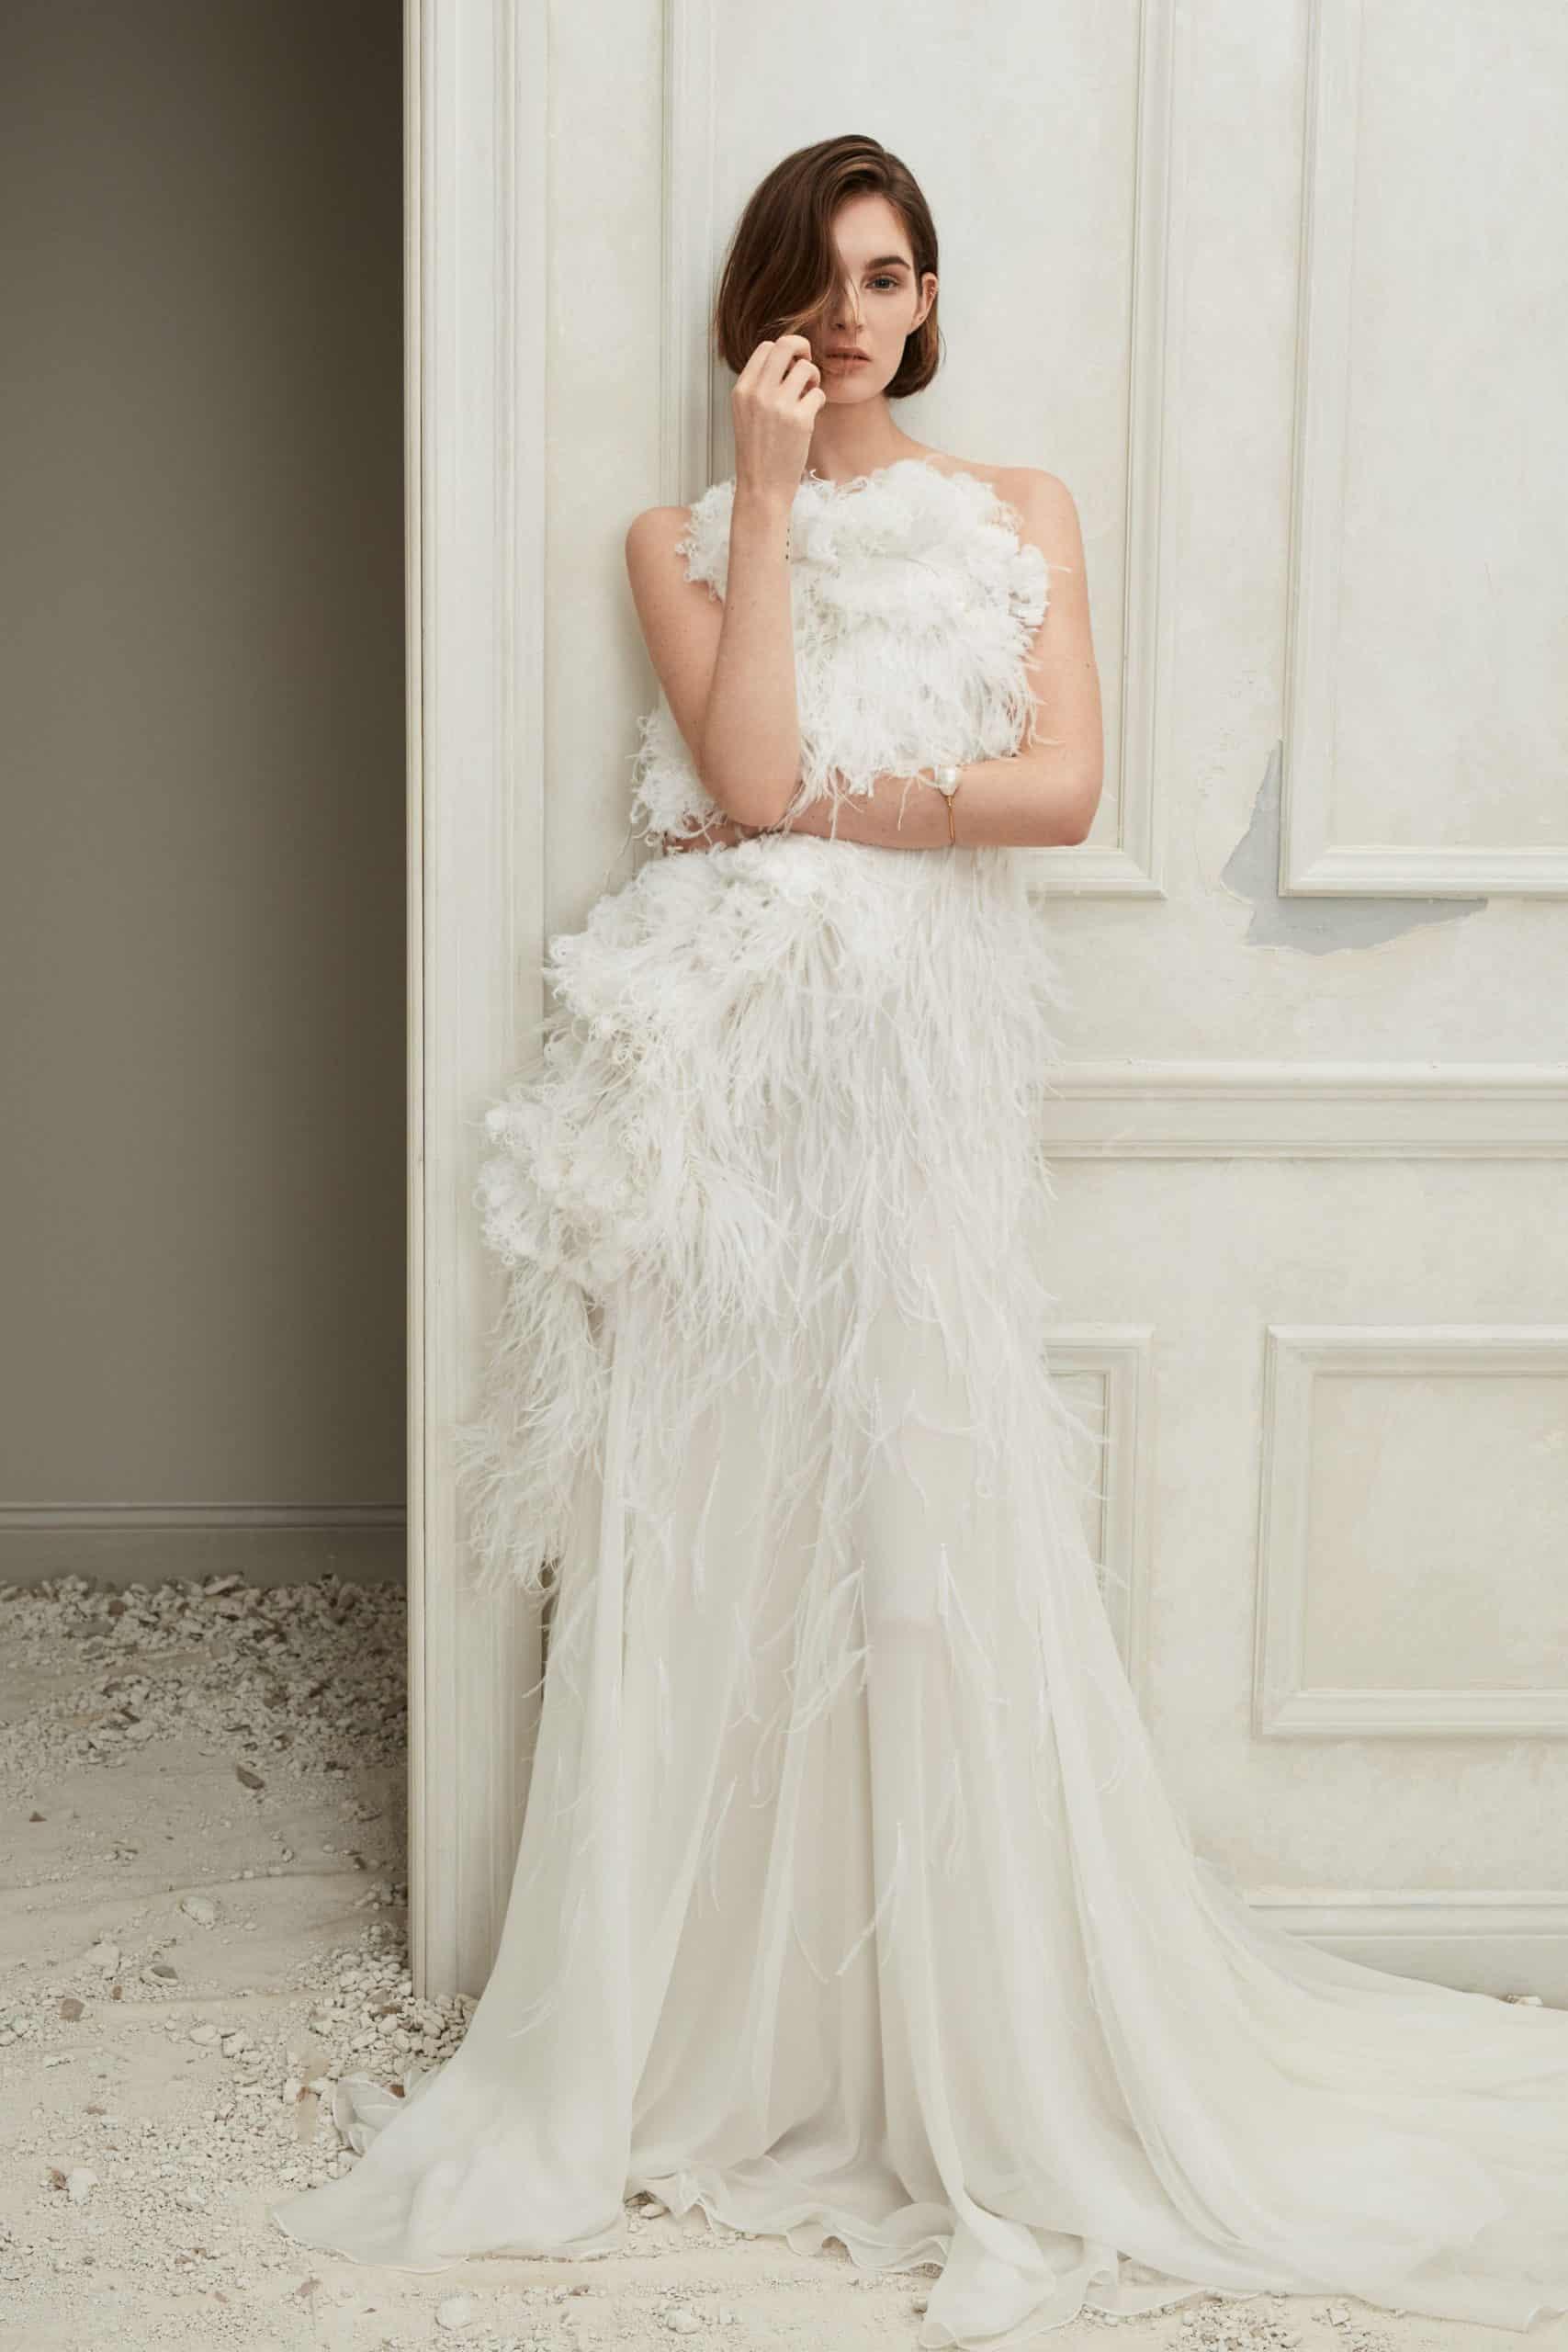 wedding dress with feathers fall 2019 by Oscar de la Renta